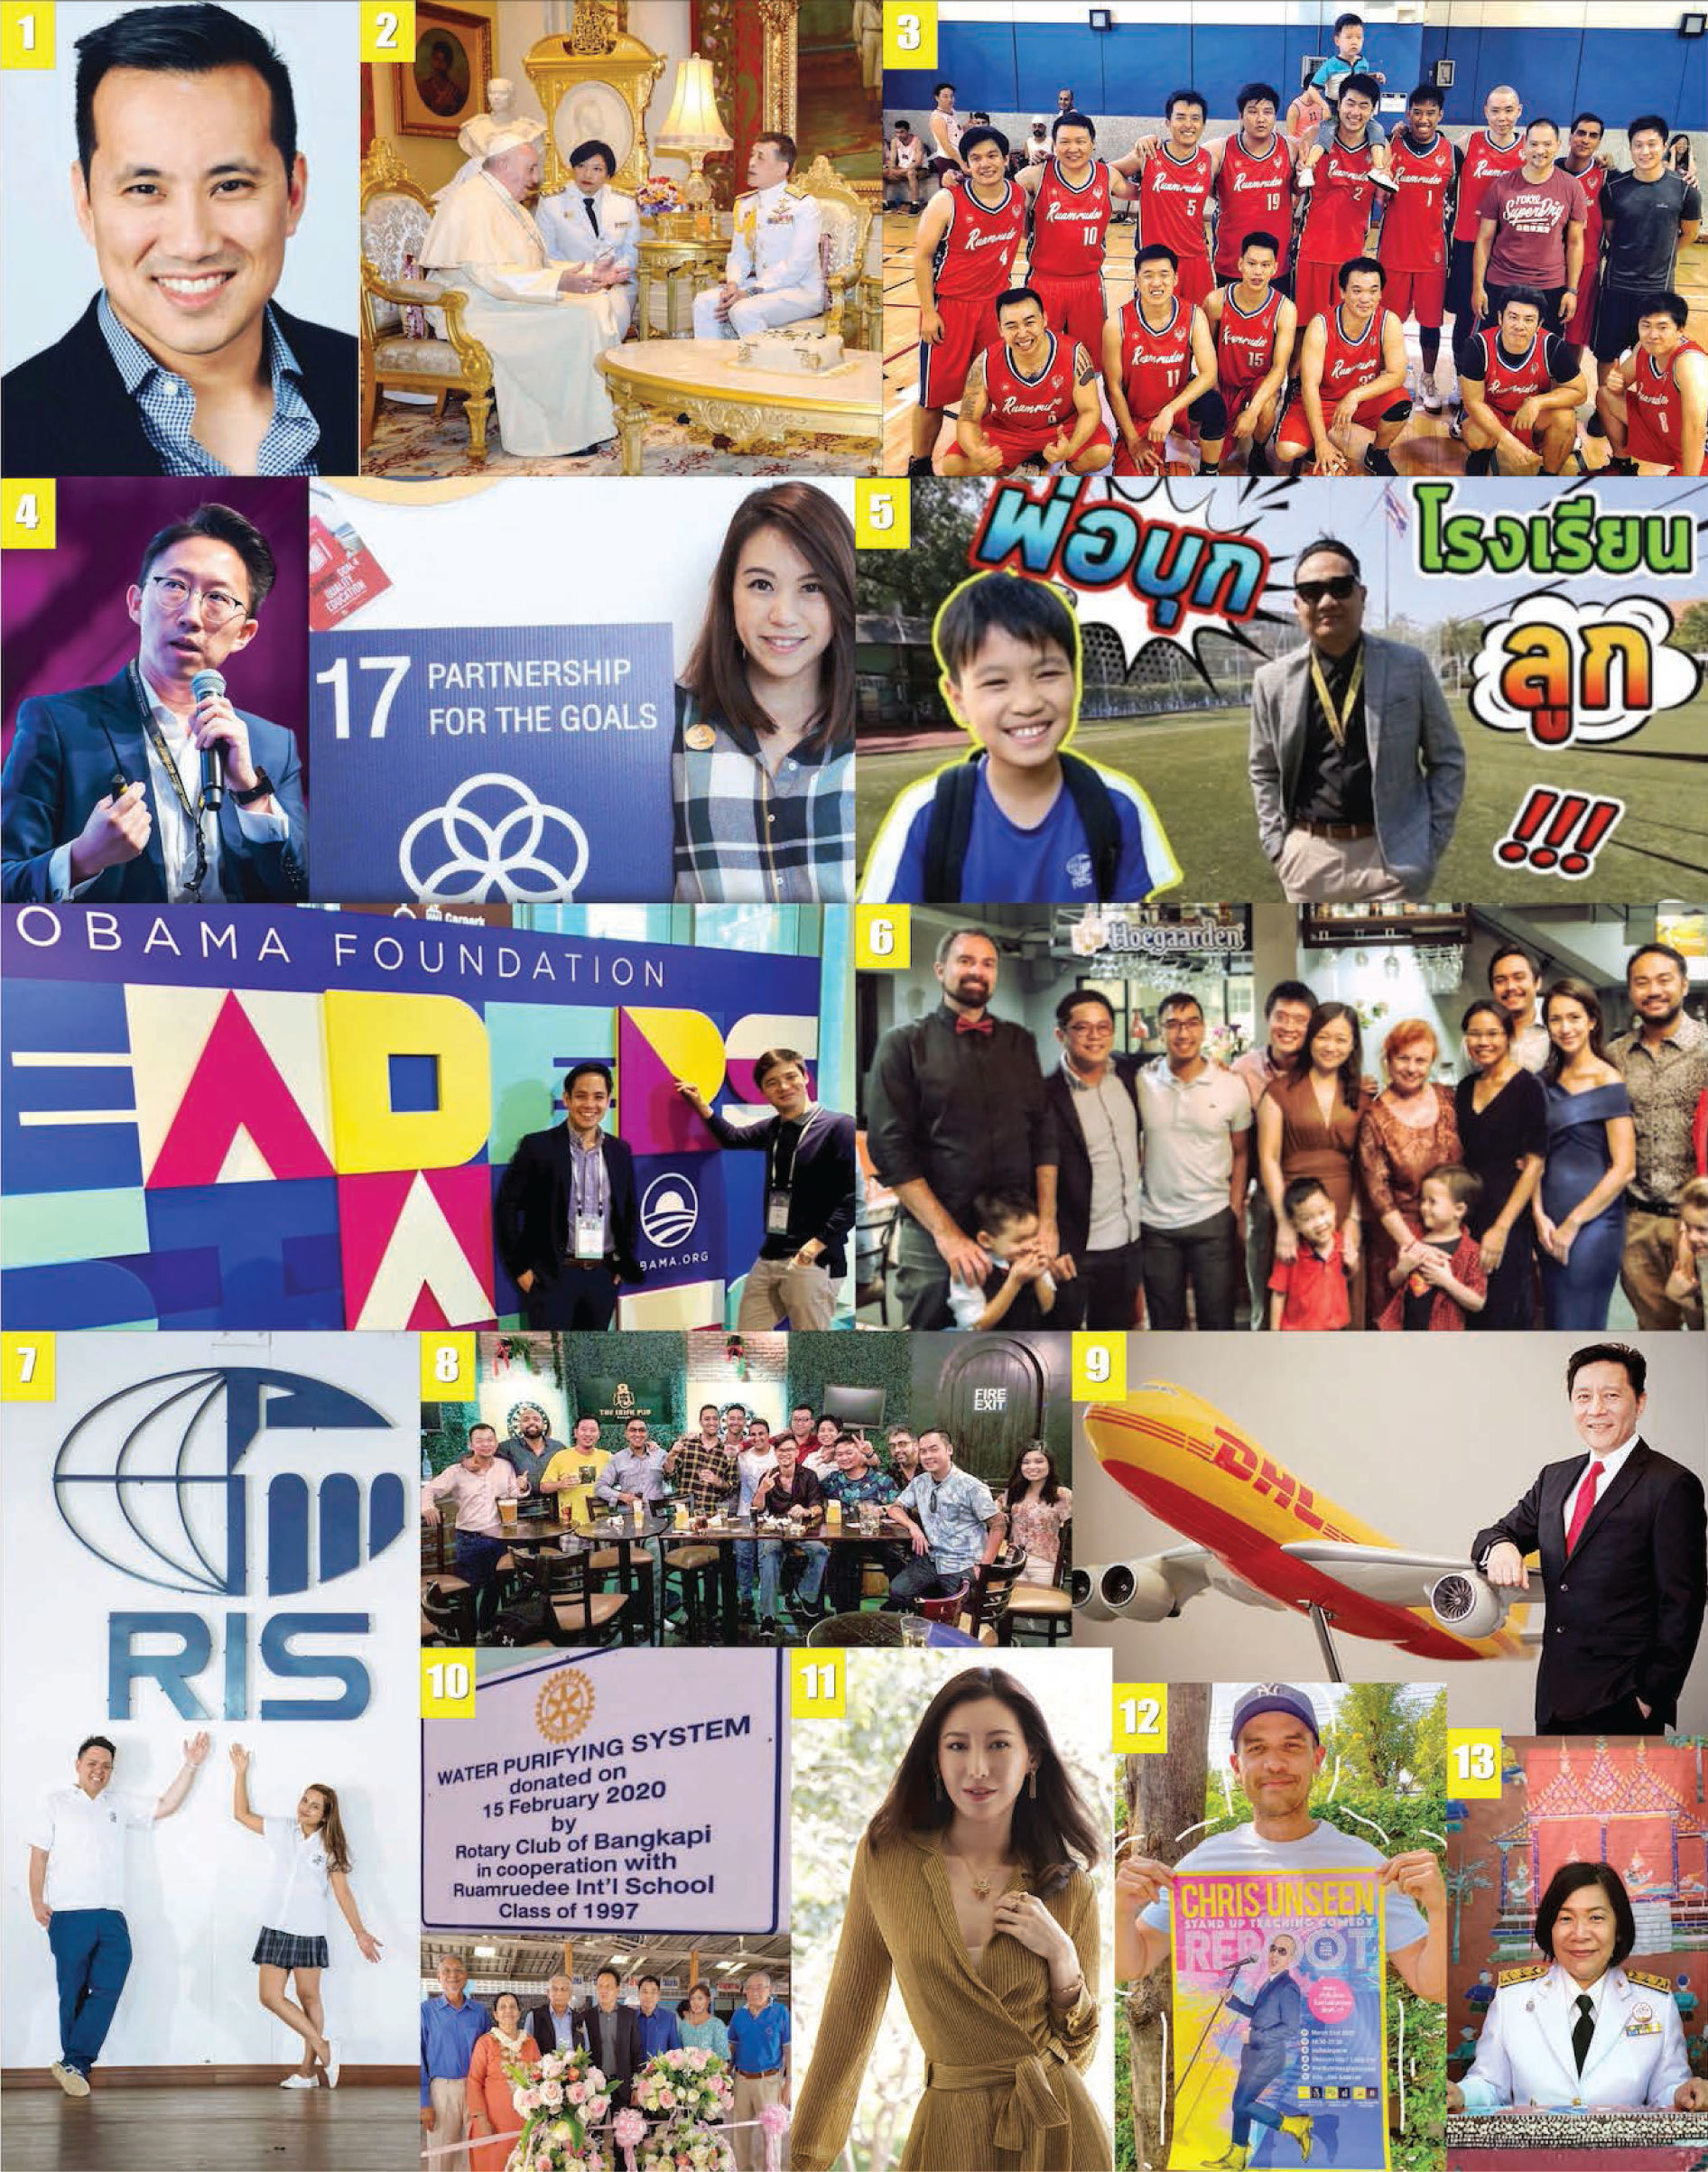 Alumni News Round Up, Ruamrudee International School Bangkok, Thailand, RIS Alumni